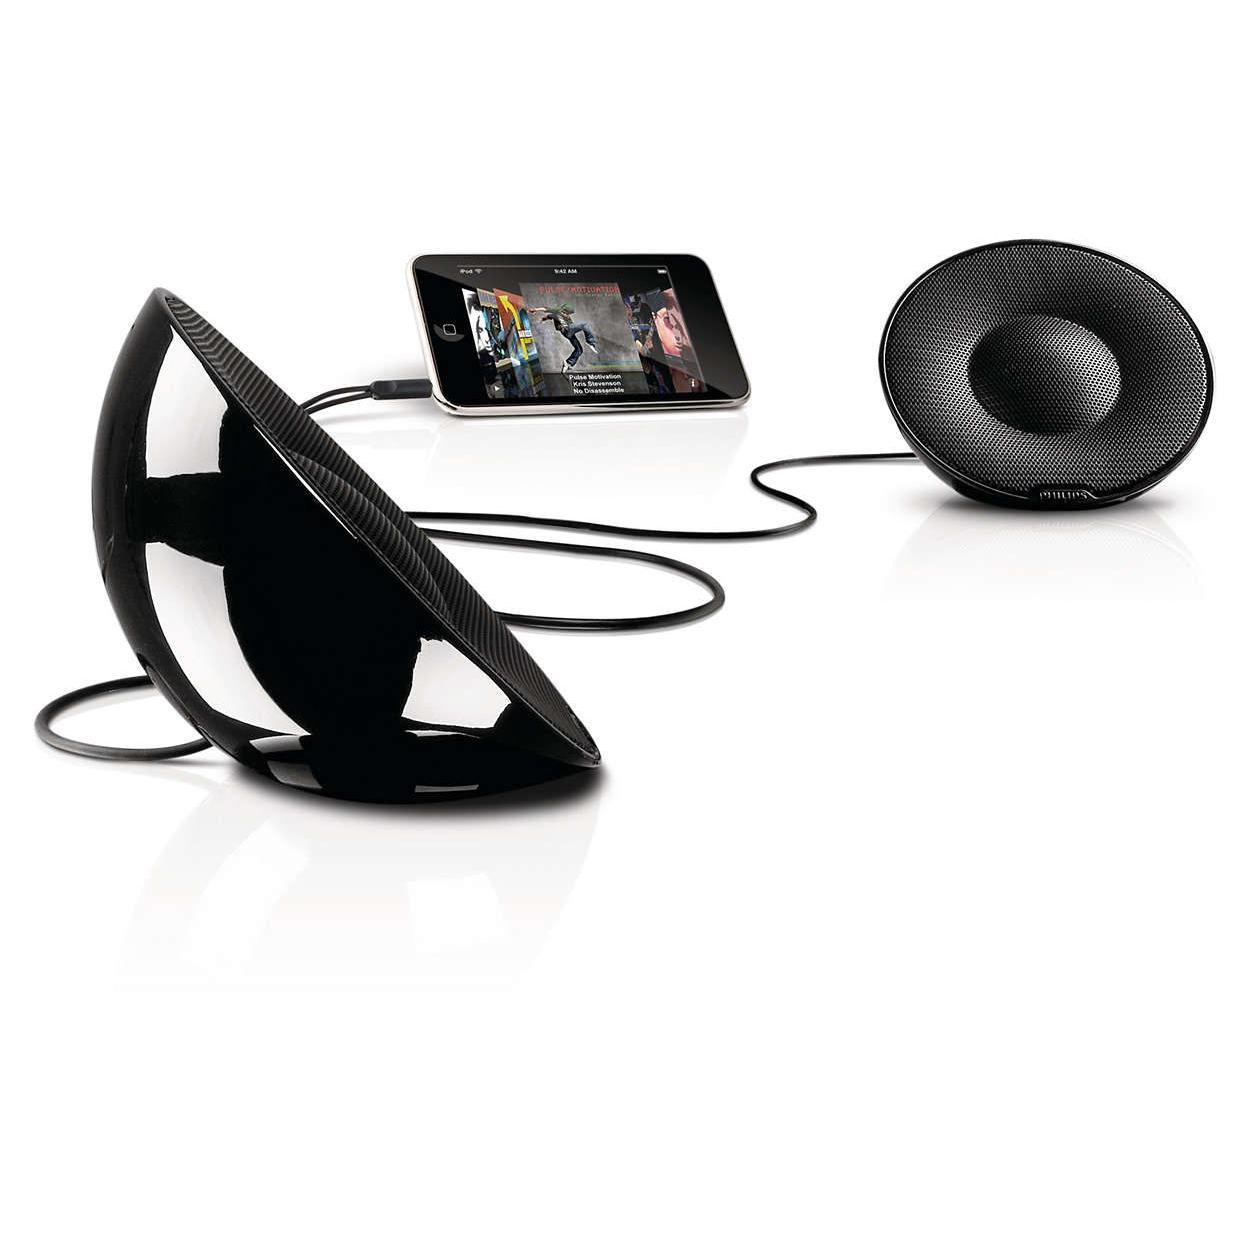 Enceinte portable Philips SBP1120/10 - Noir